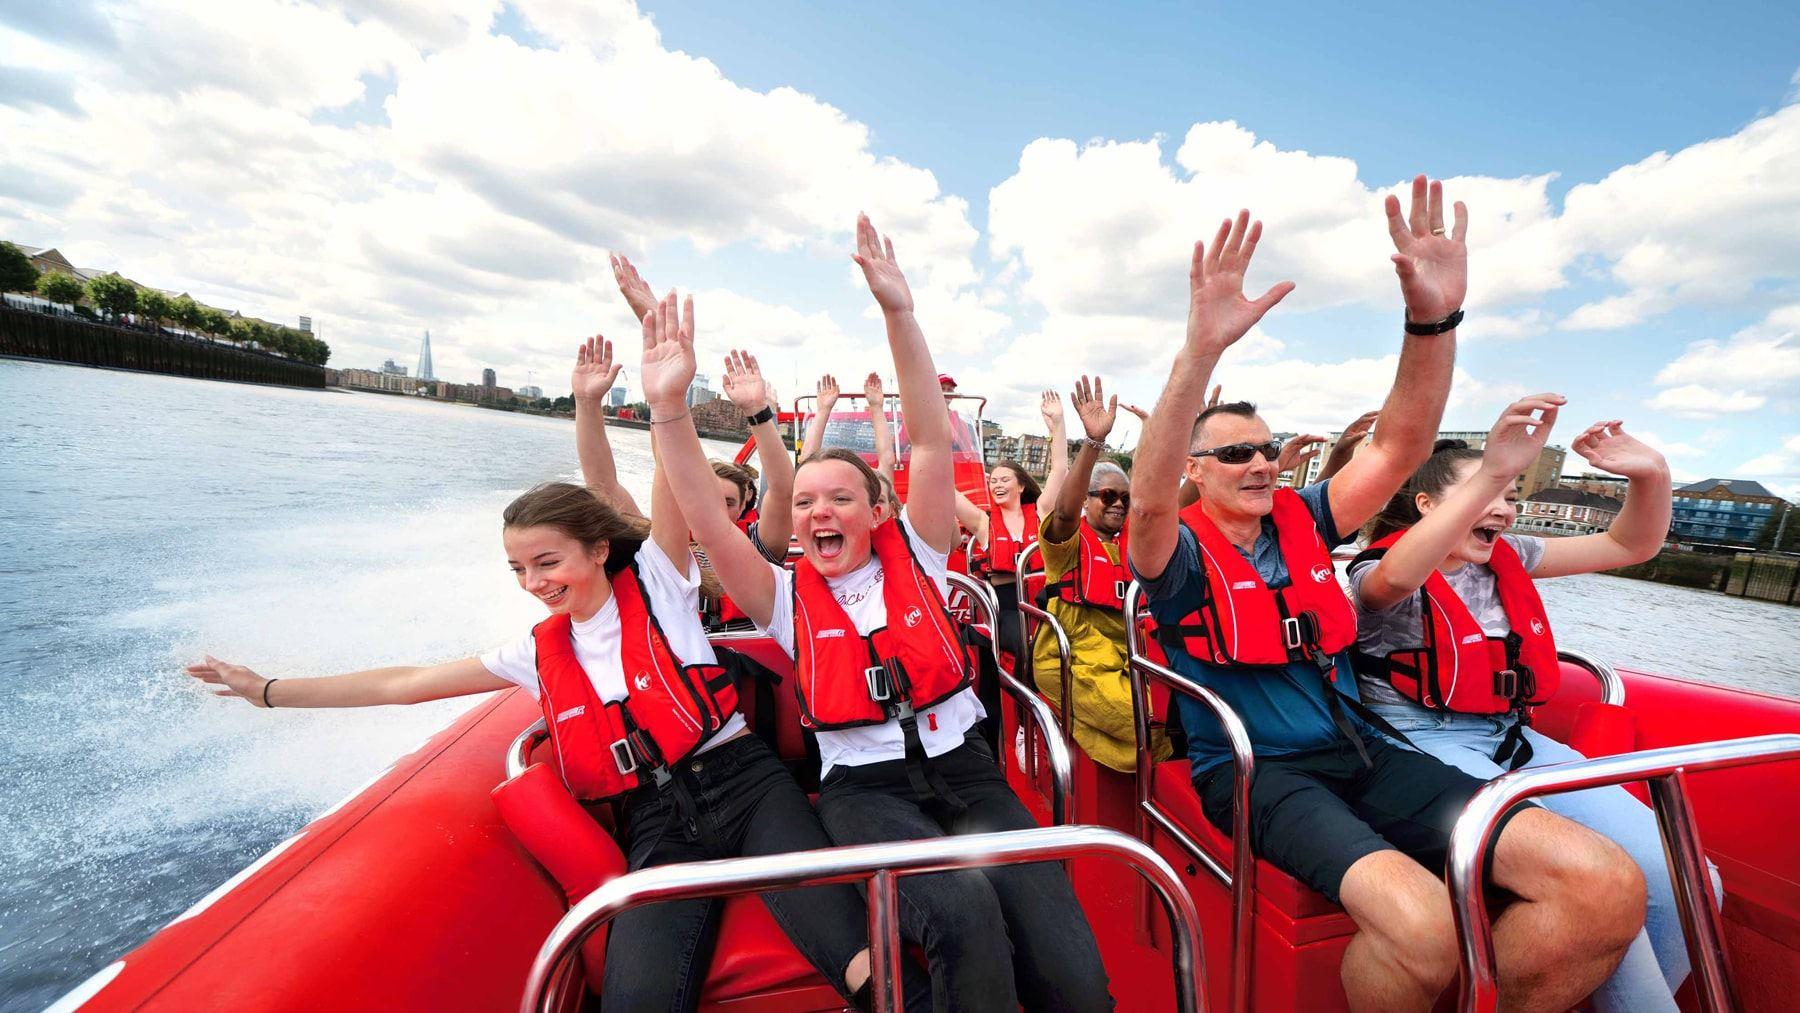 London's best and biggest speedboat voucher sale